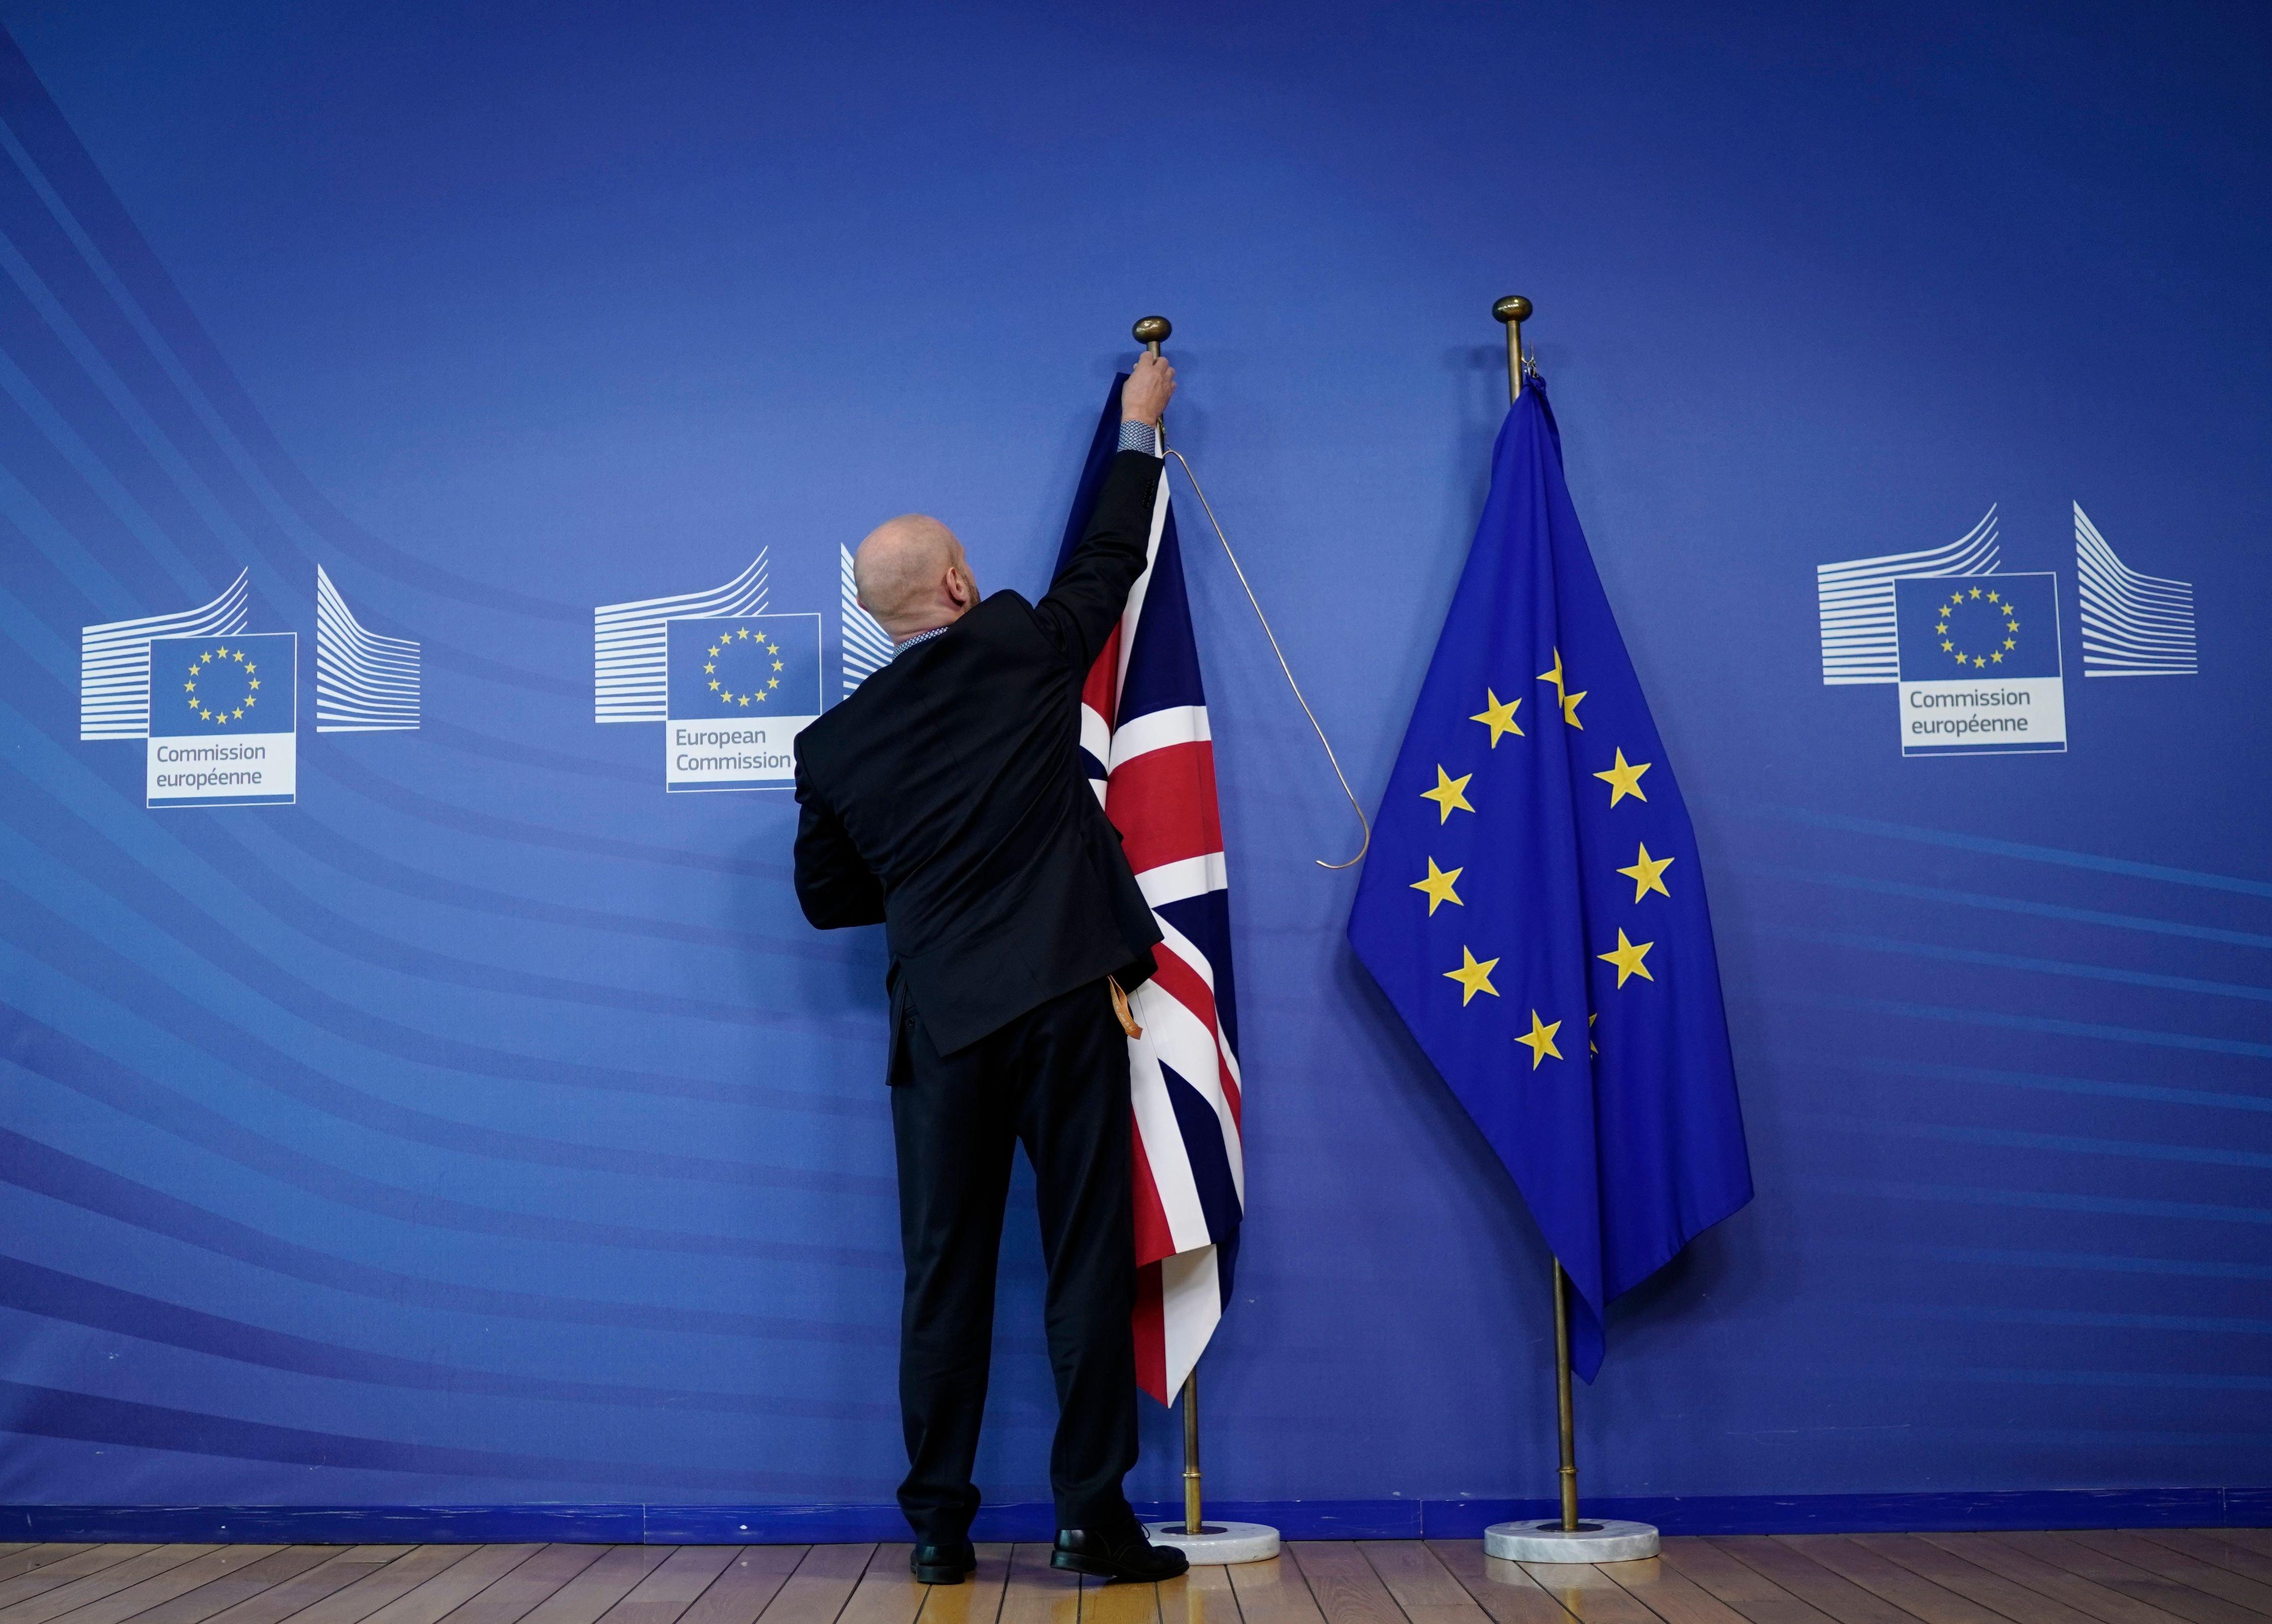 BGA-Advisor Rudolf Adam comments on the implications of Brexit in the Neue Züricher Zeitung